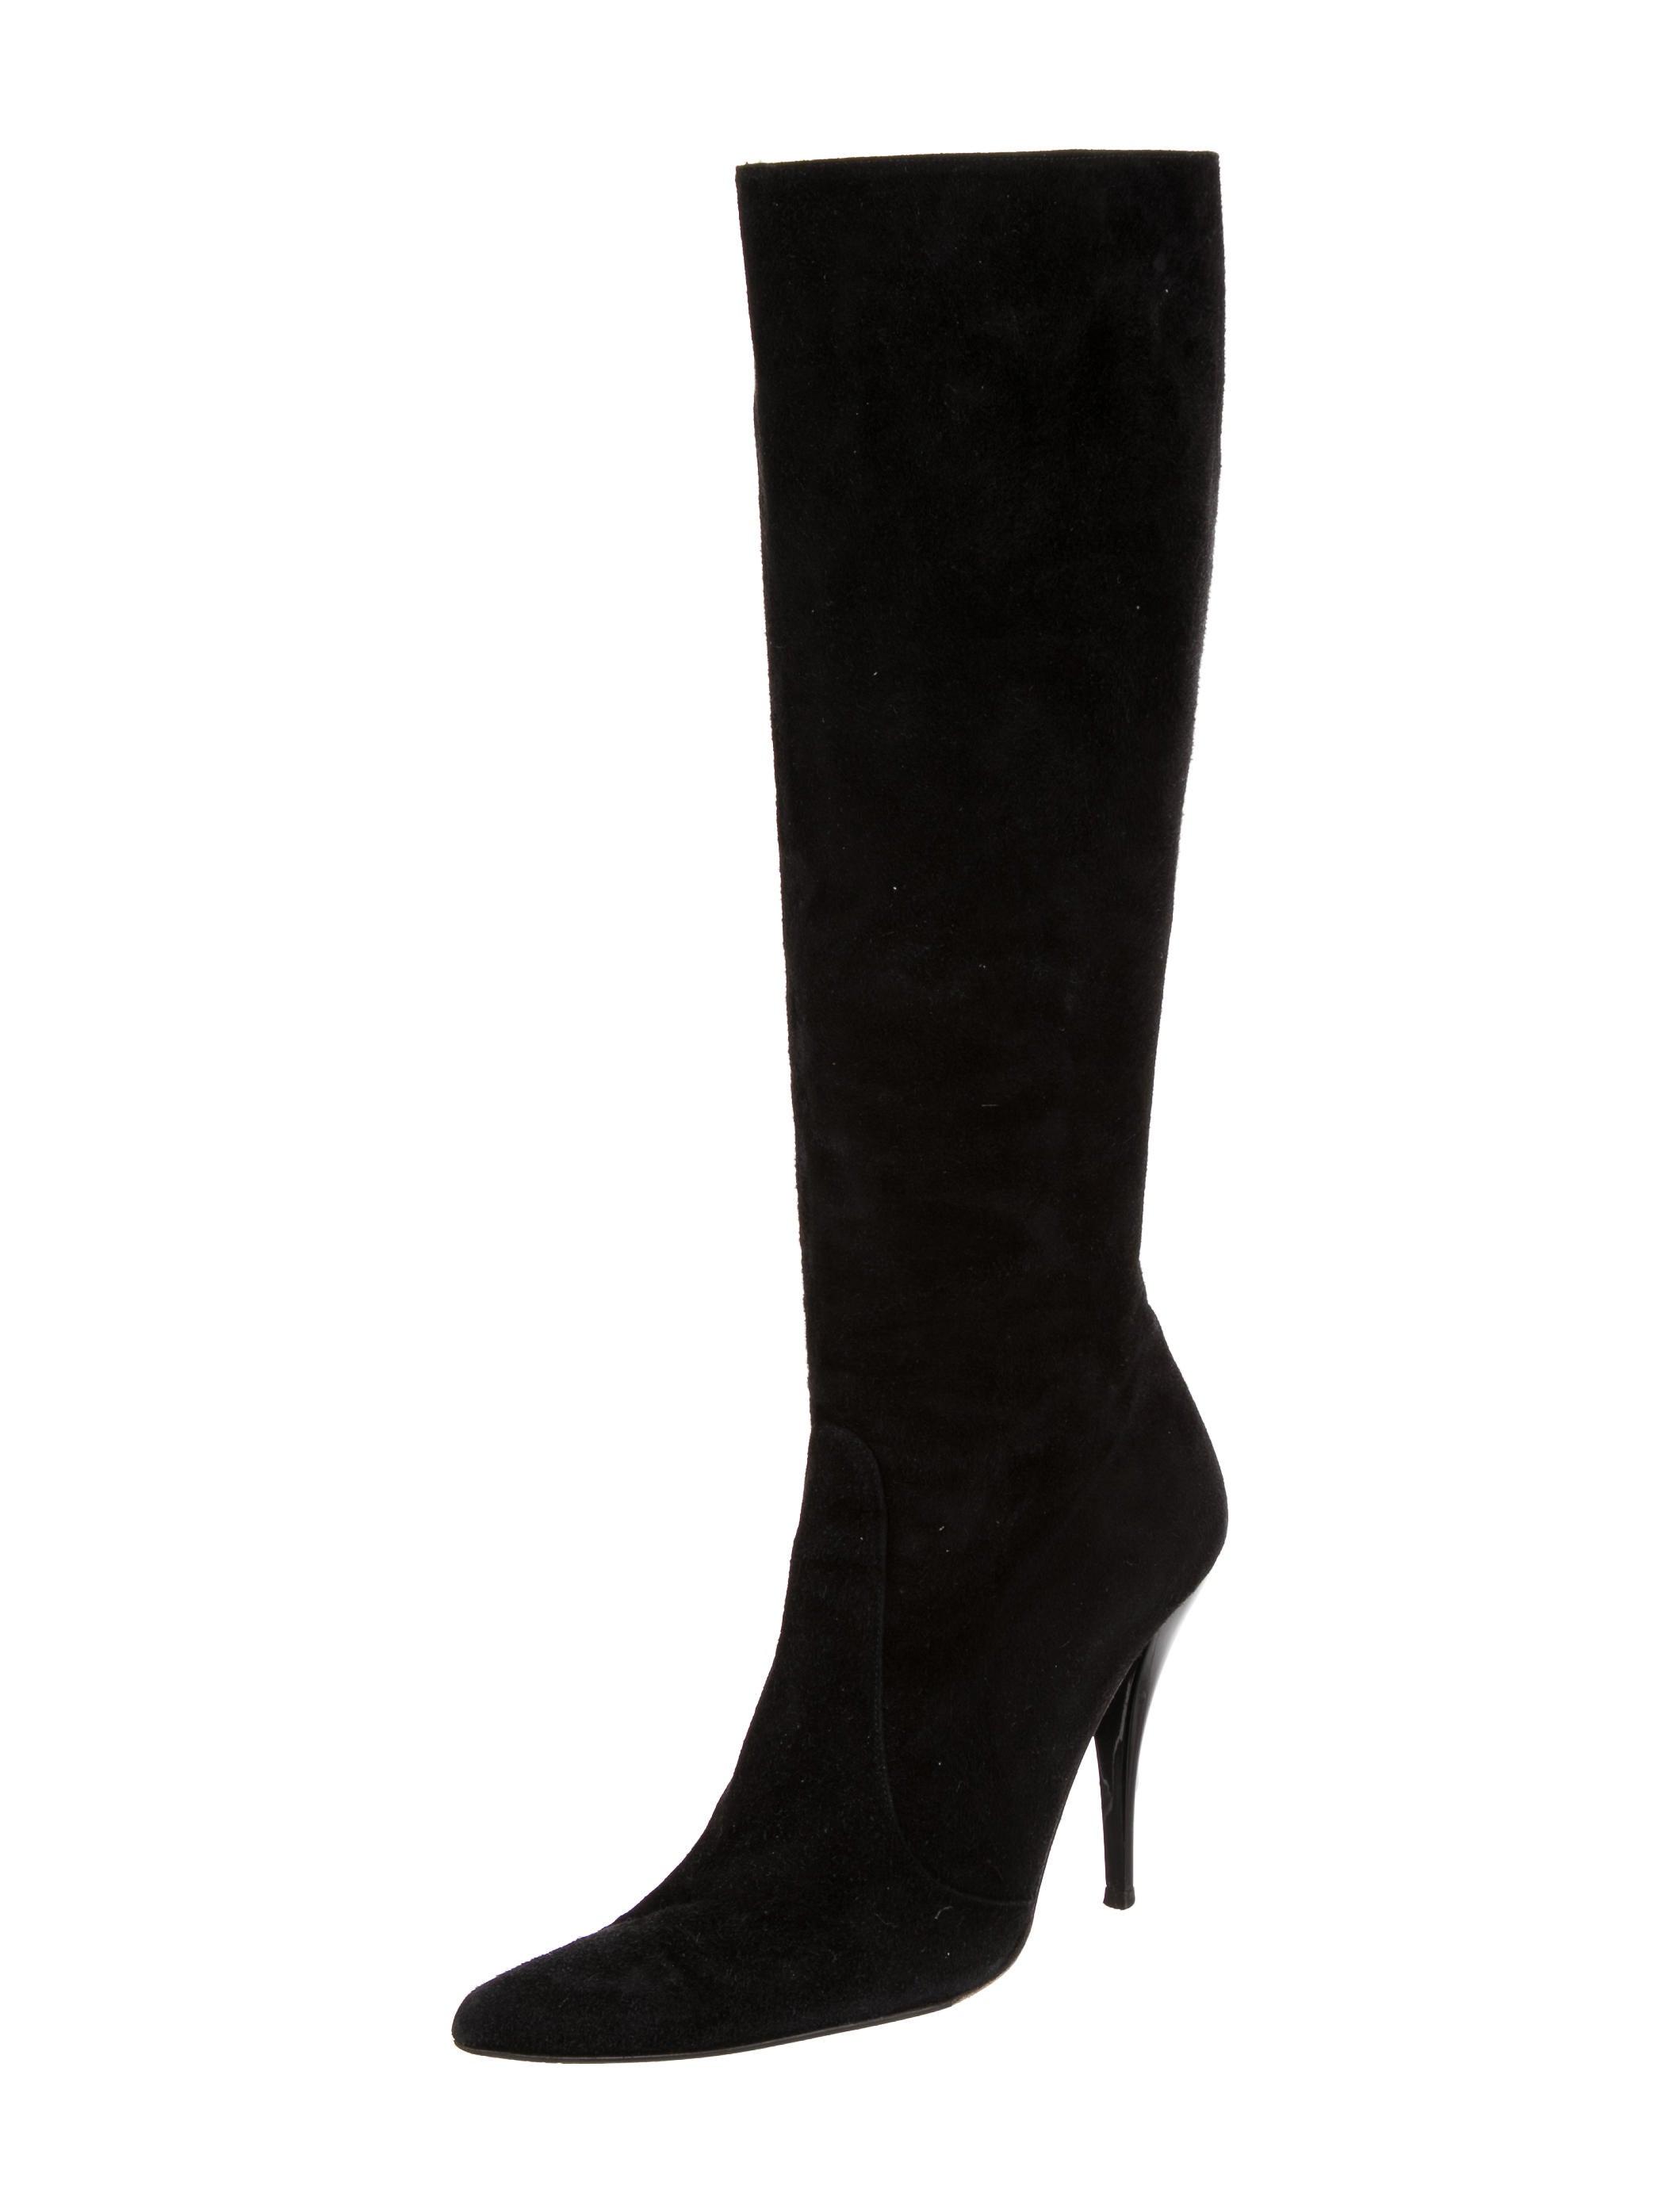 stuart weitzman suede knee high boots shoes wsu26591